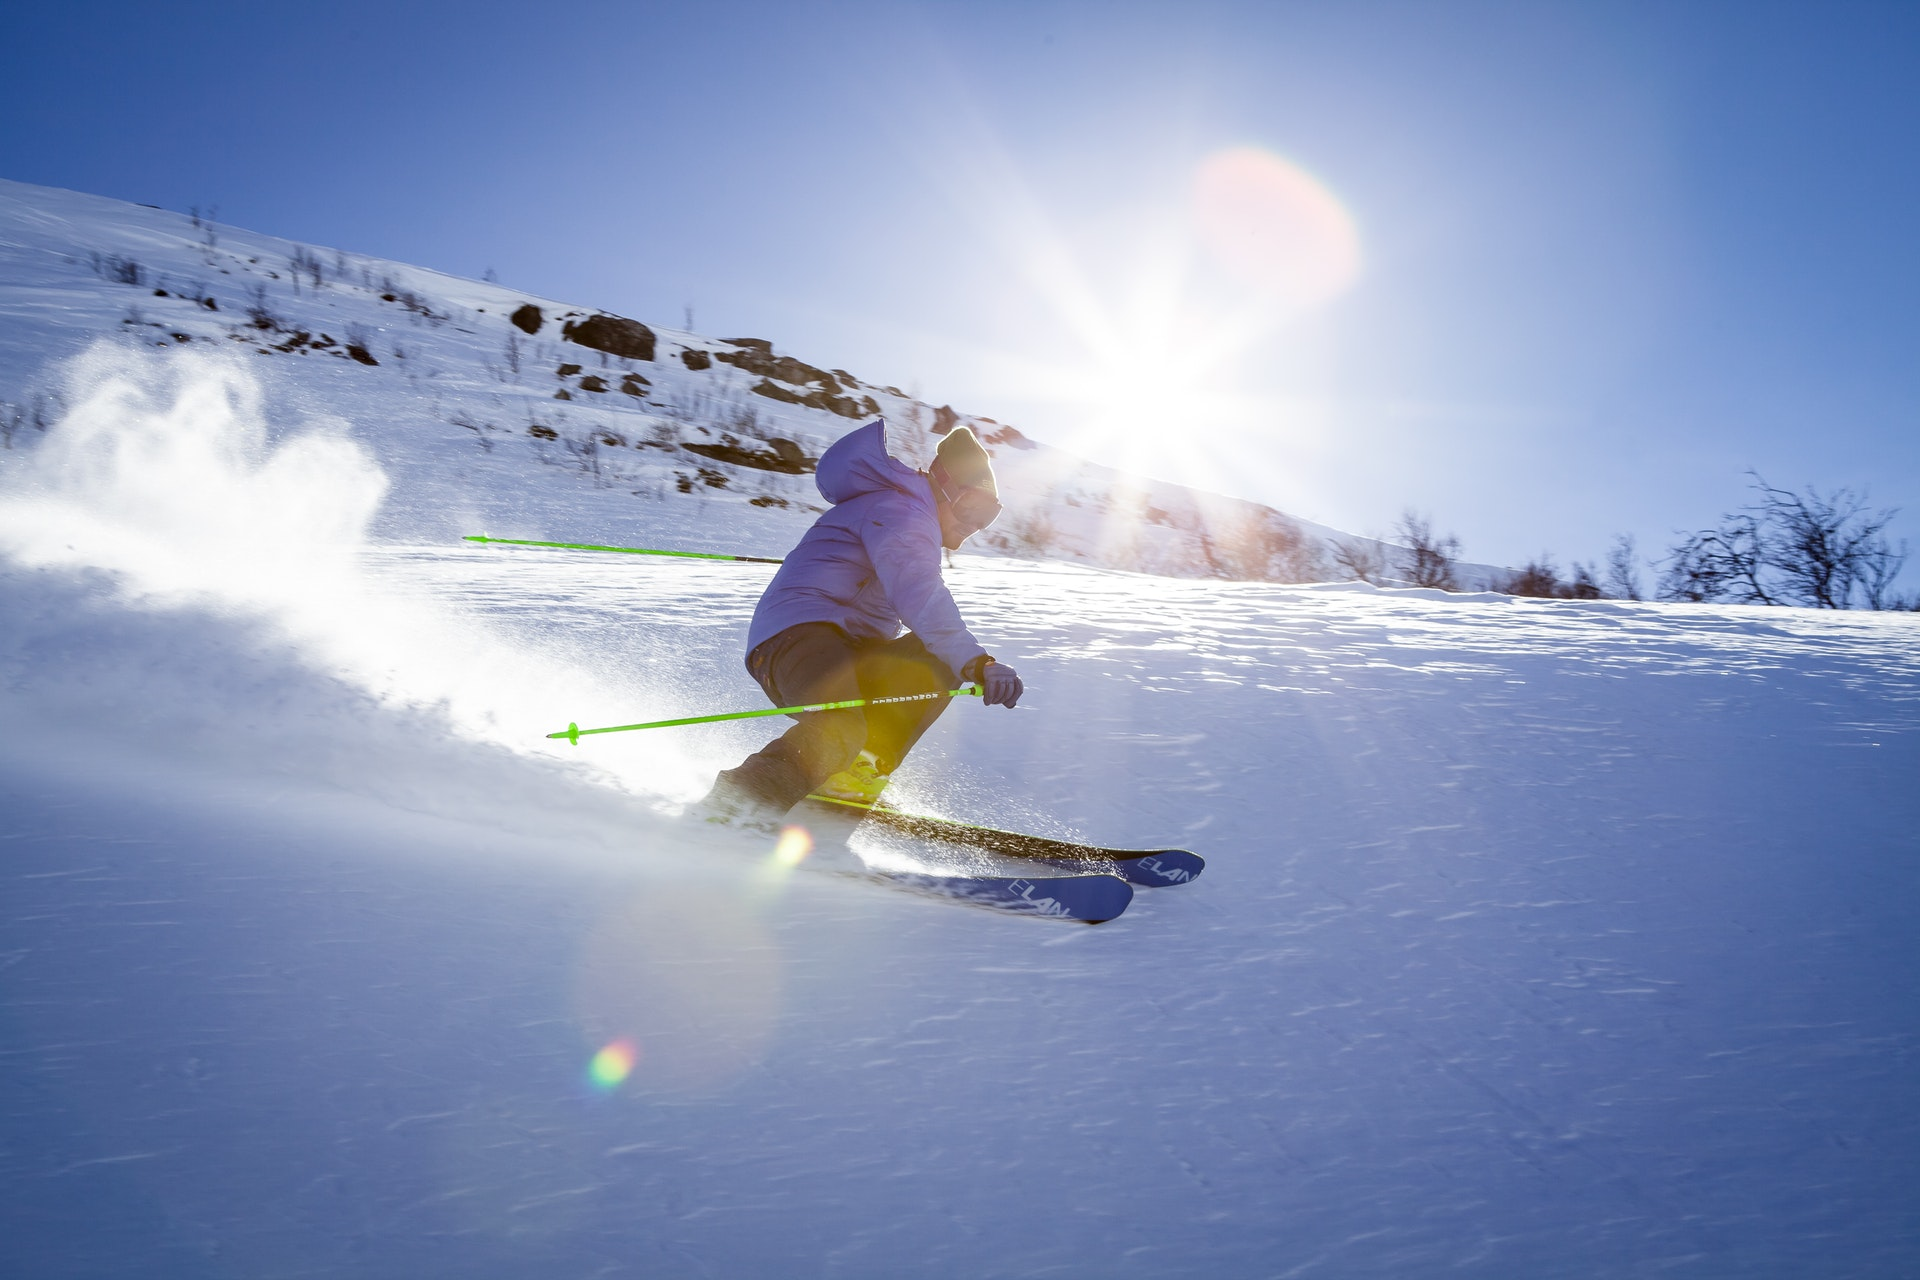 Skiferie, ski, vinter, vinterferie, sne, kulde, koldt, sol